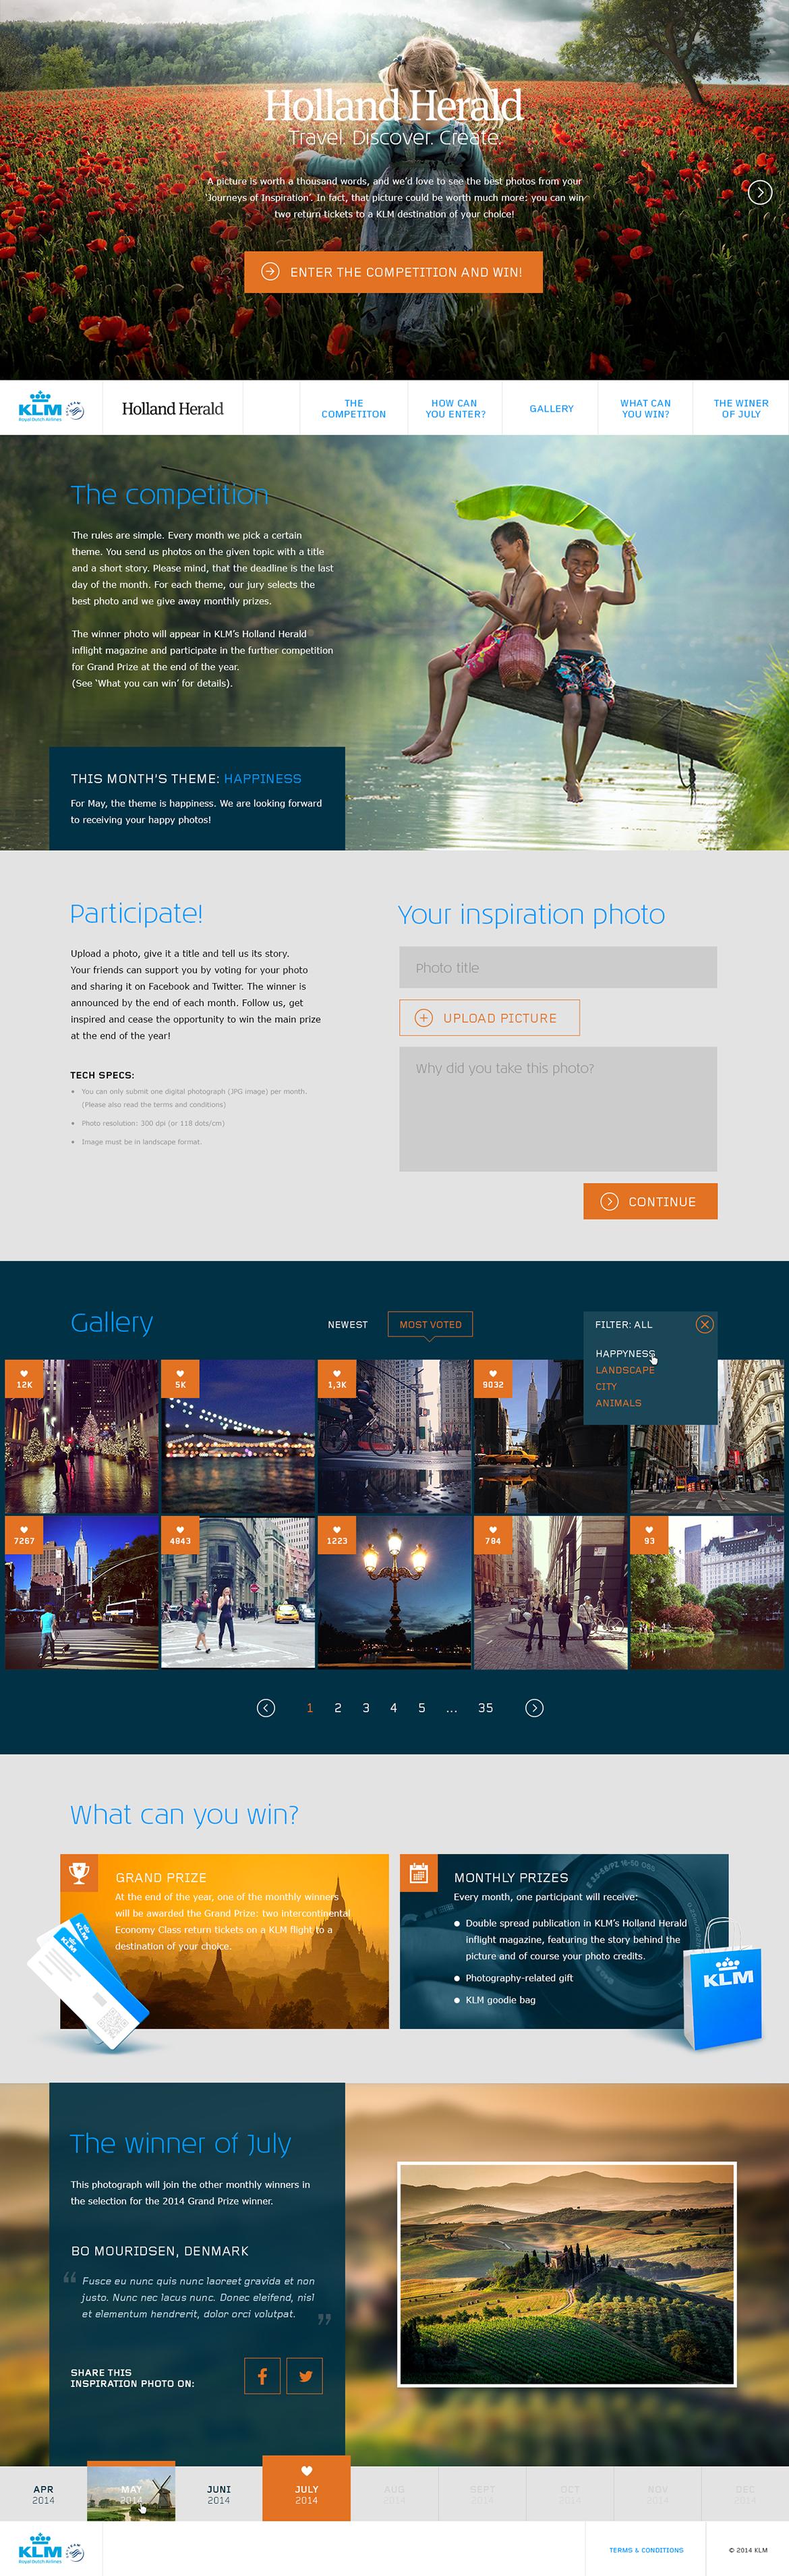 KLM-Photo_Homepage